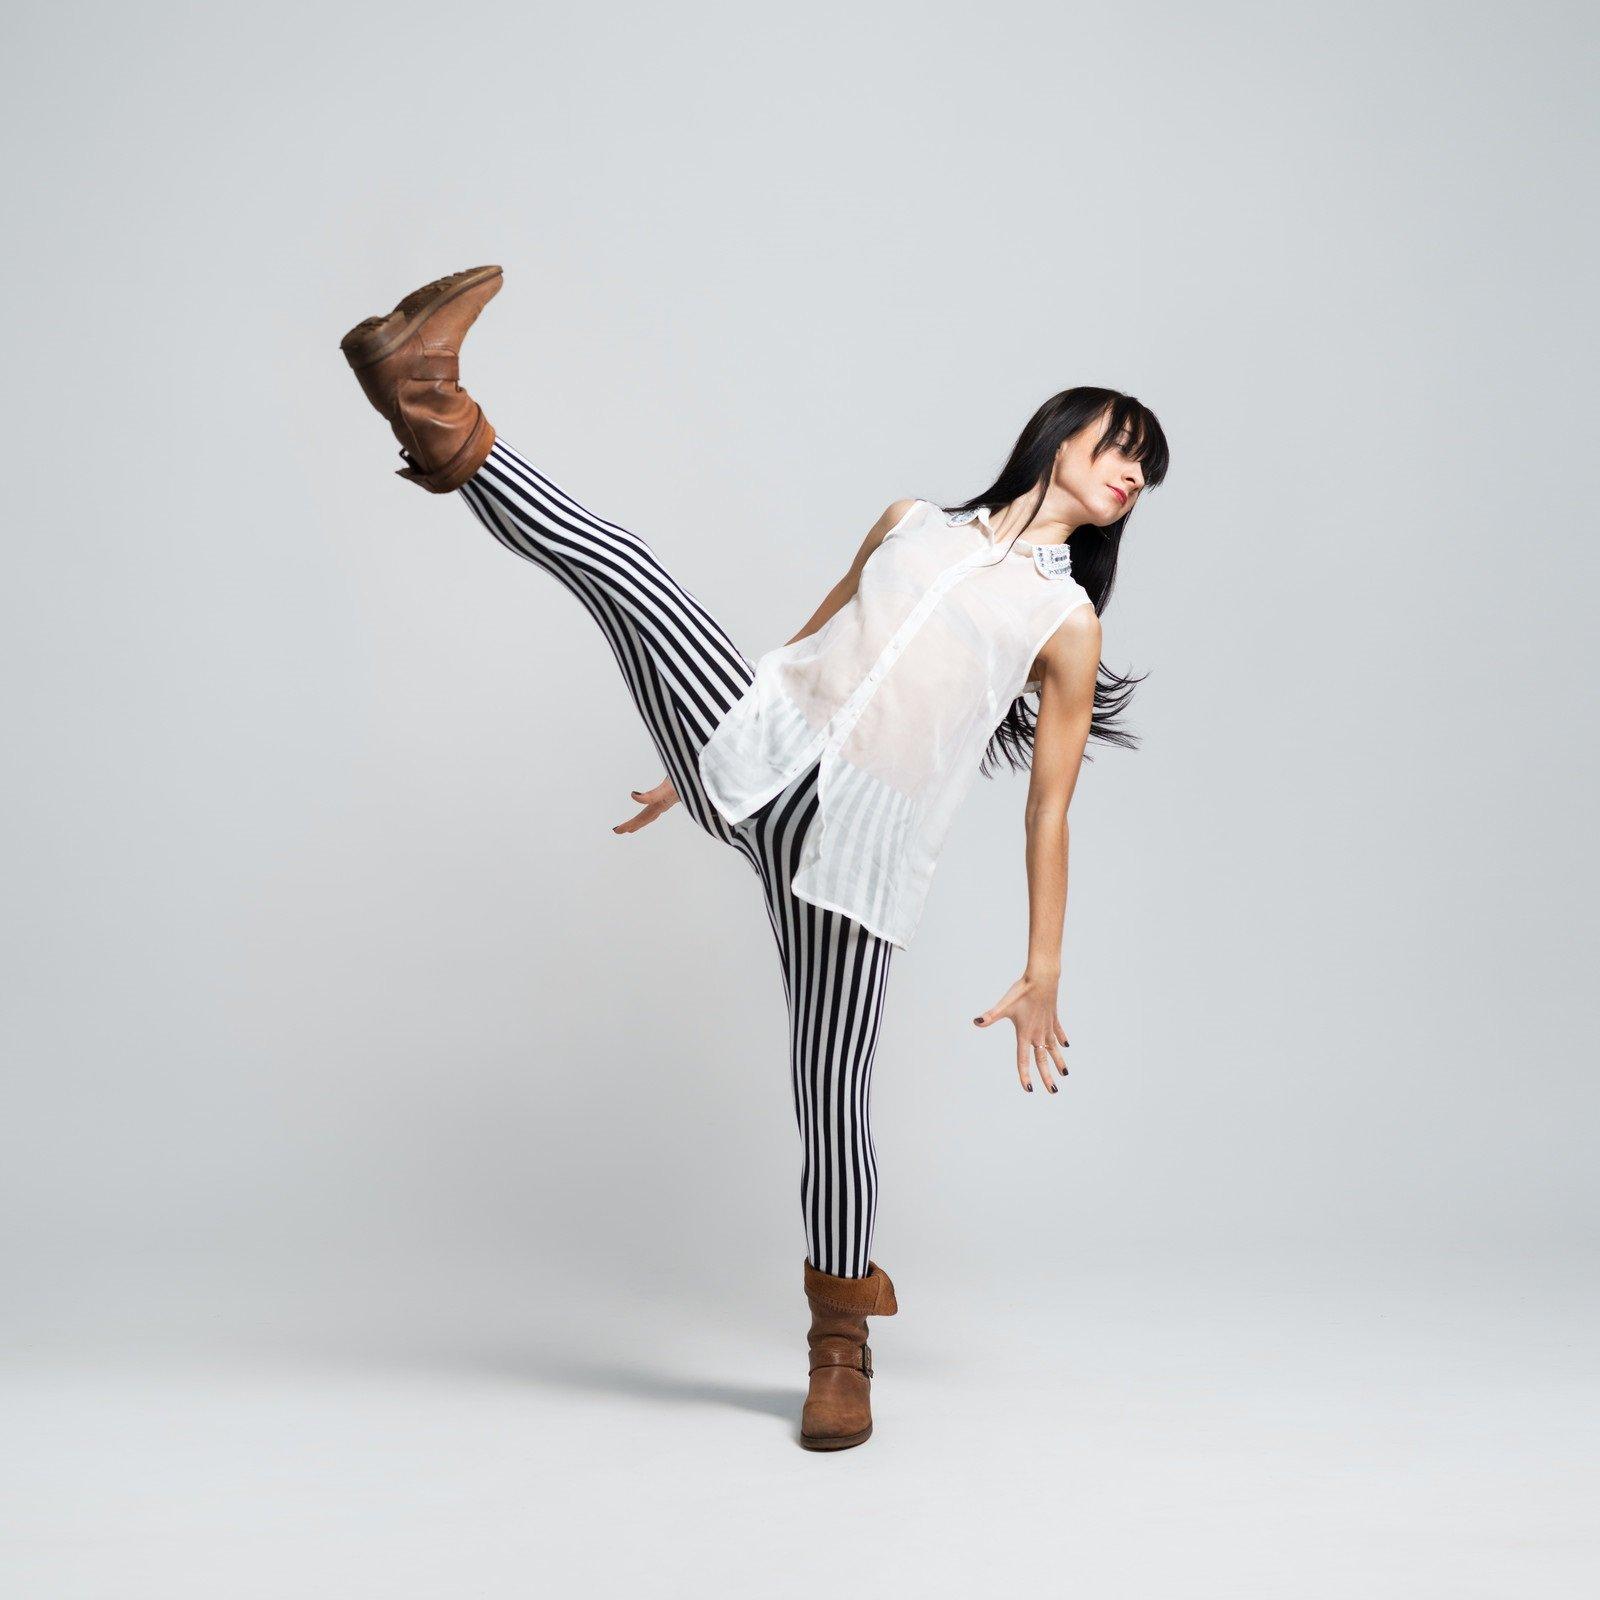 Lyrical/Contemporary Dance